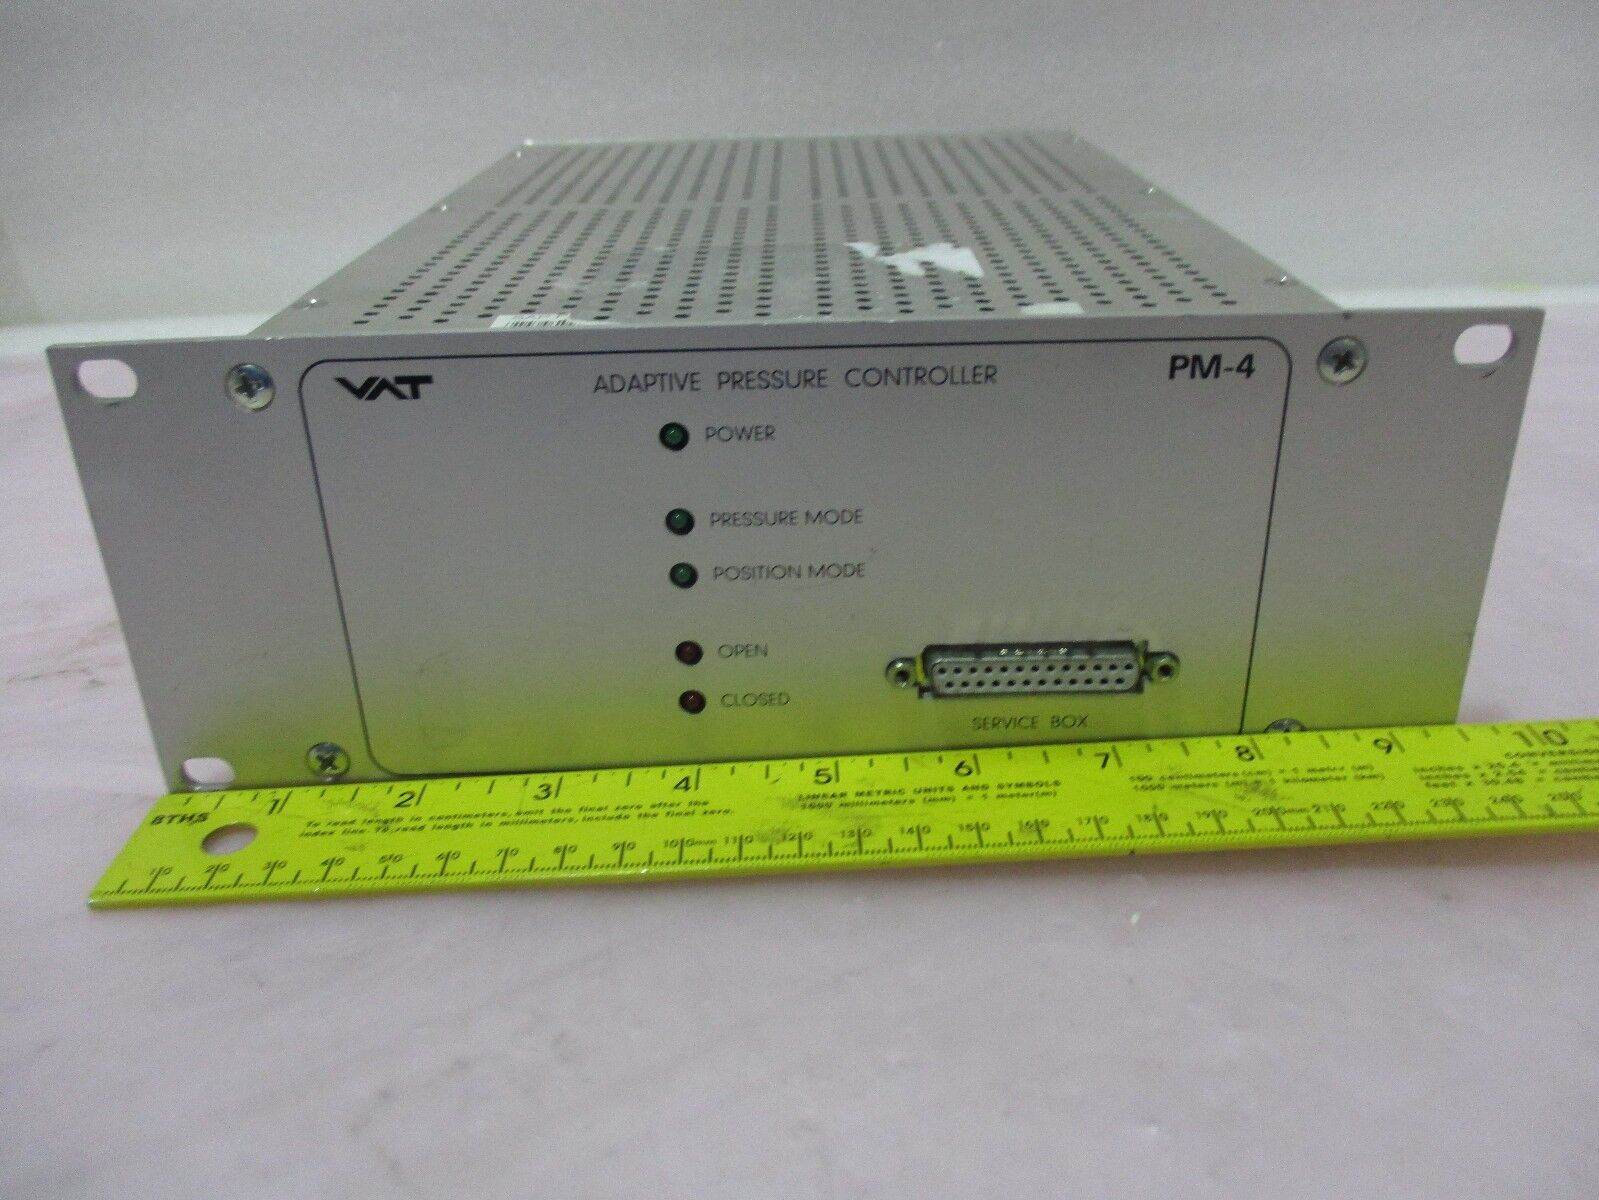 VAT PM-4 Adaptive Pressure Controller FABR 641PM-94NM-1001/005  420427